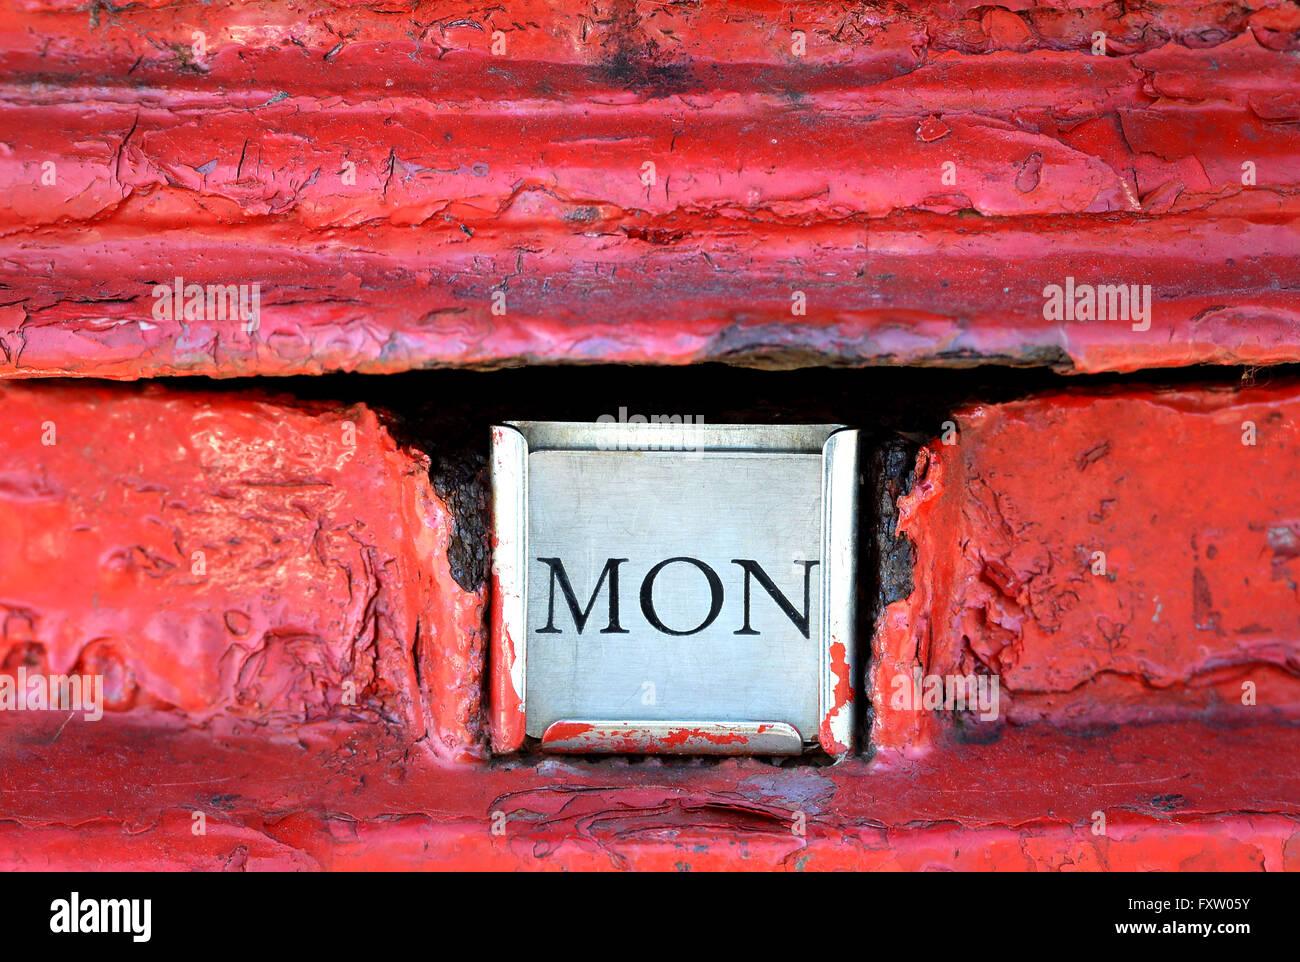 Rusty red post box, Monday - Stock Image